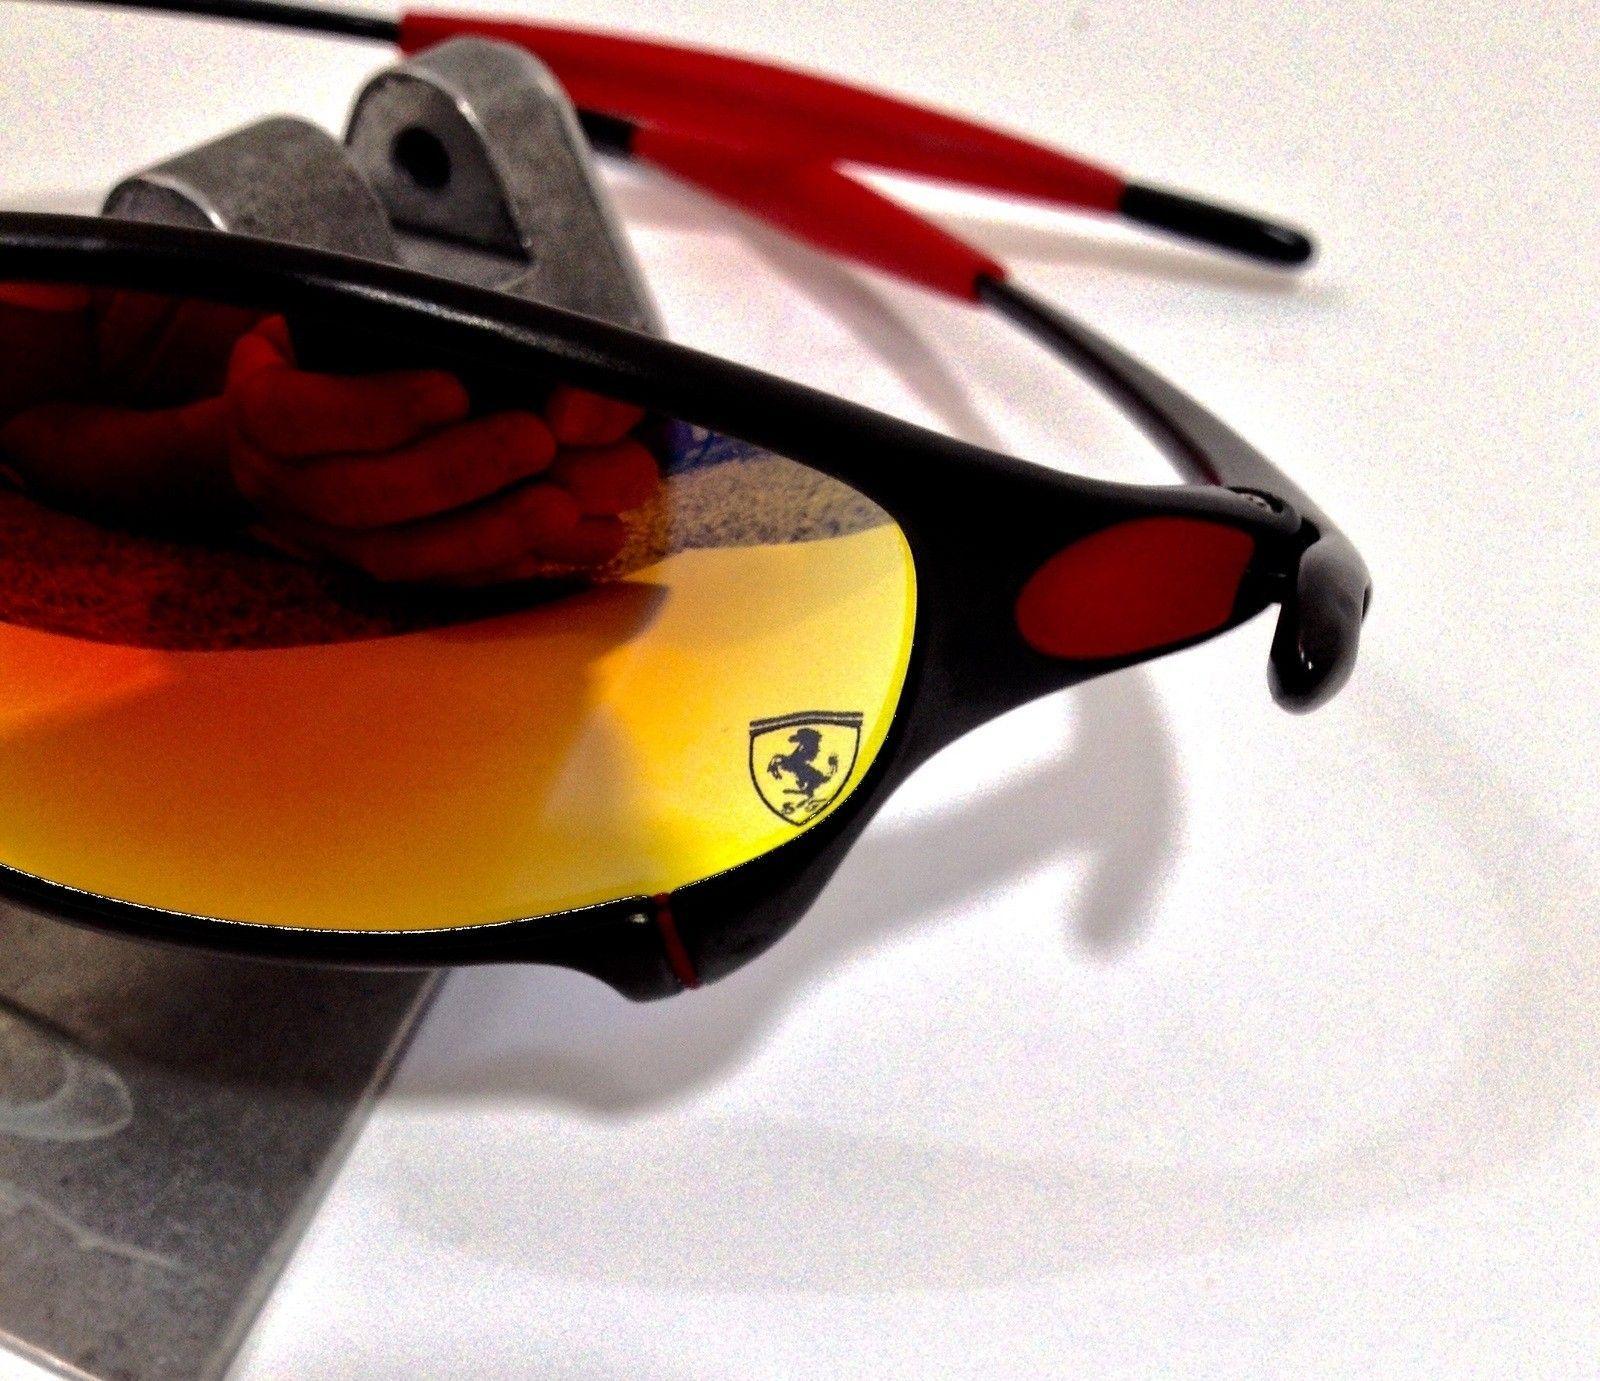 Juliets Ferrari edition - image.jpg